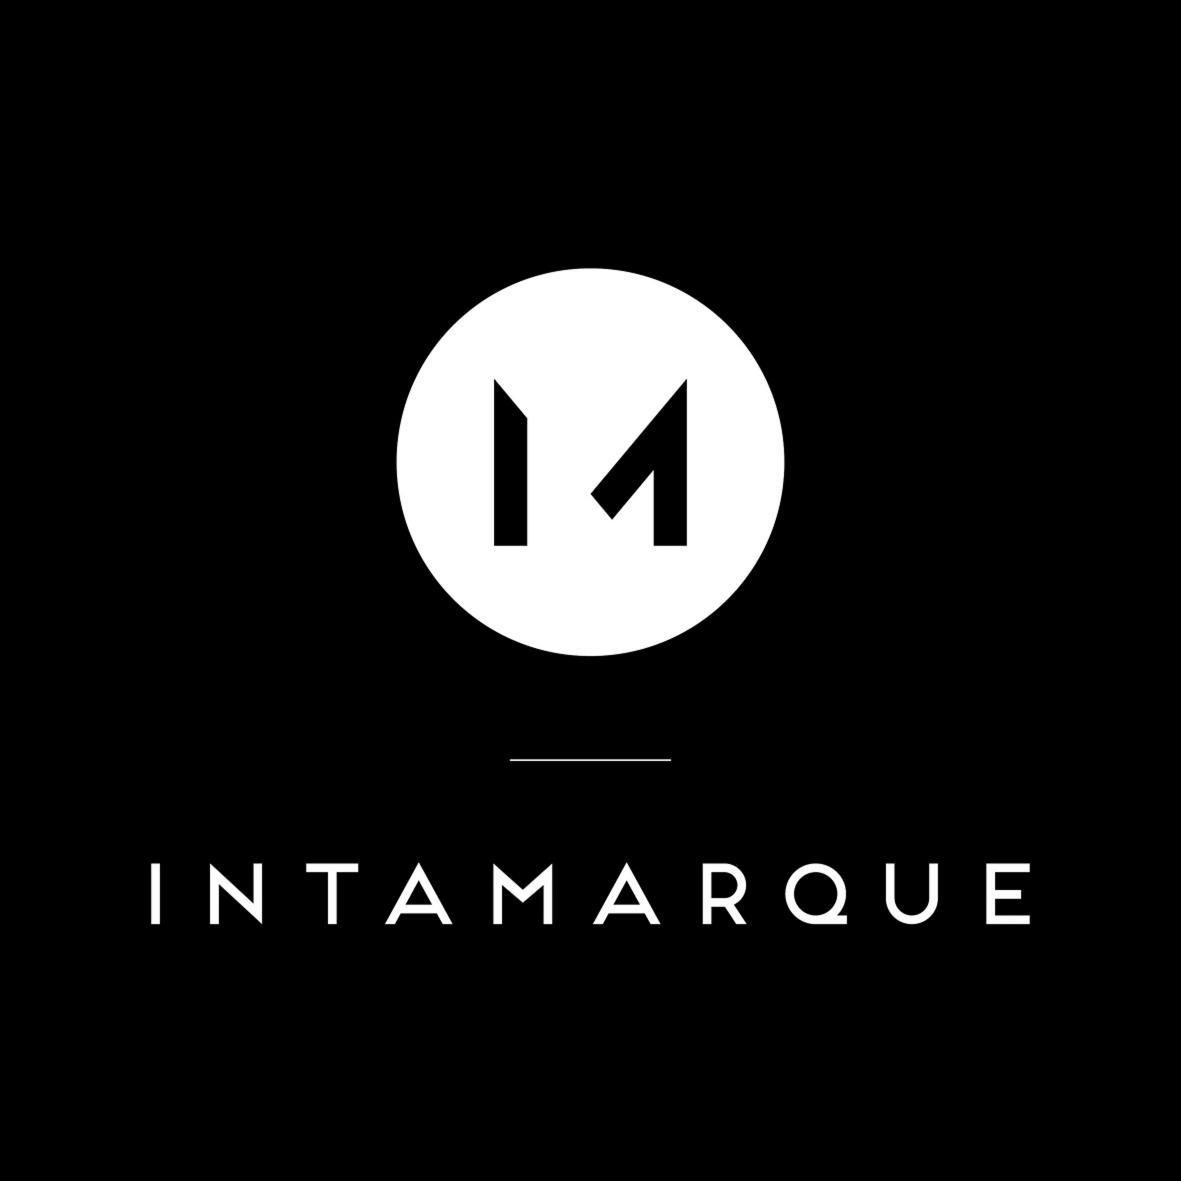 Intamarque Limited